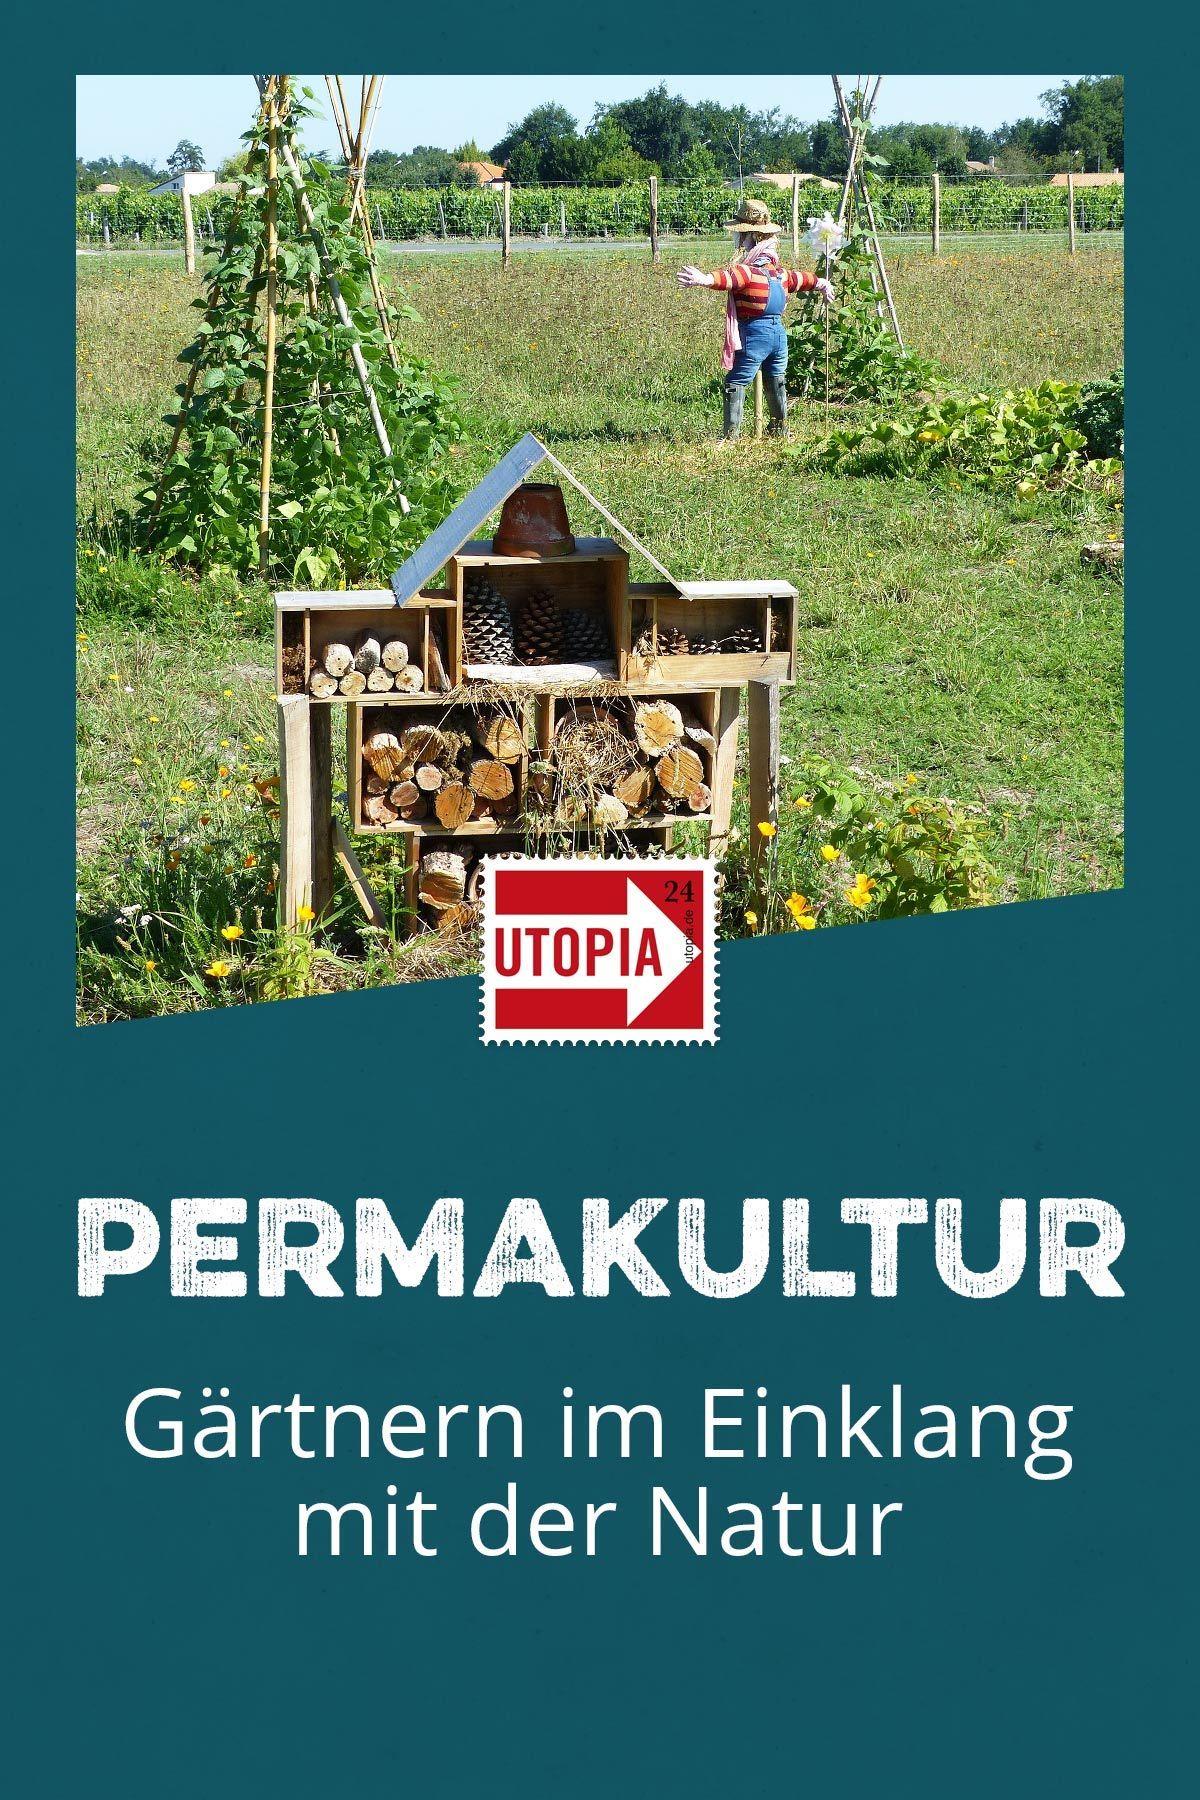 Photo of Permakultur: hagearbeid i harmoni med naturen – Utopia.de